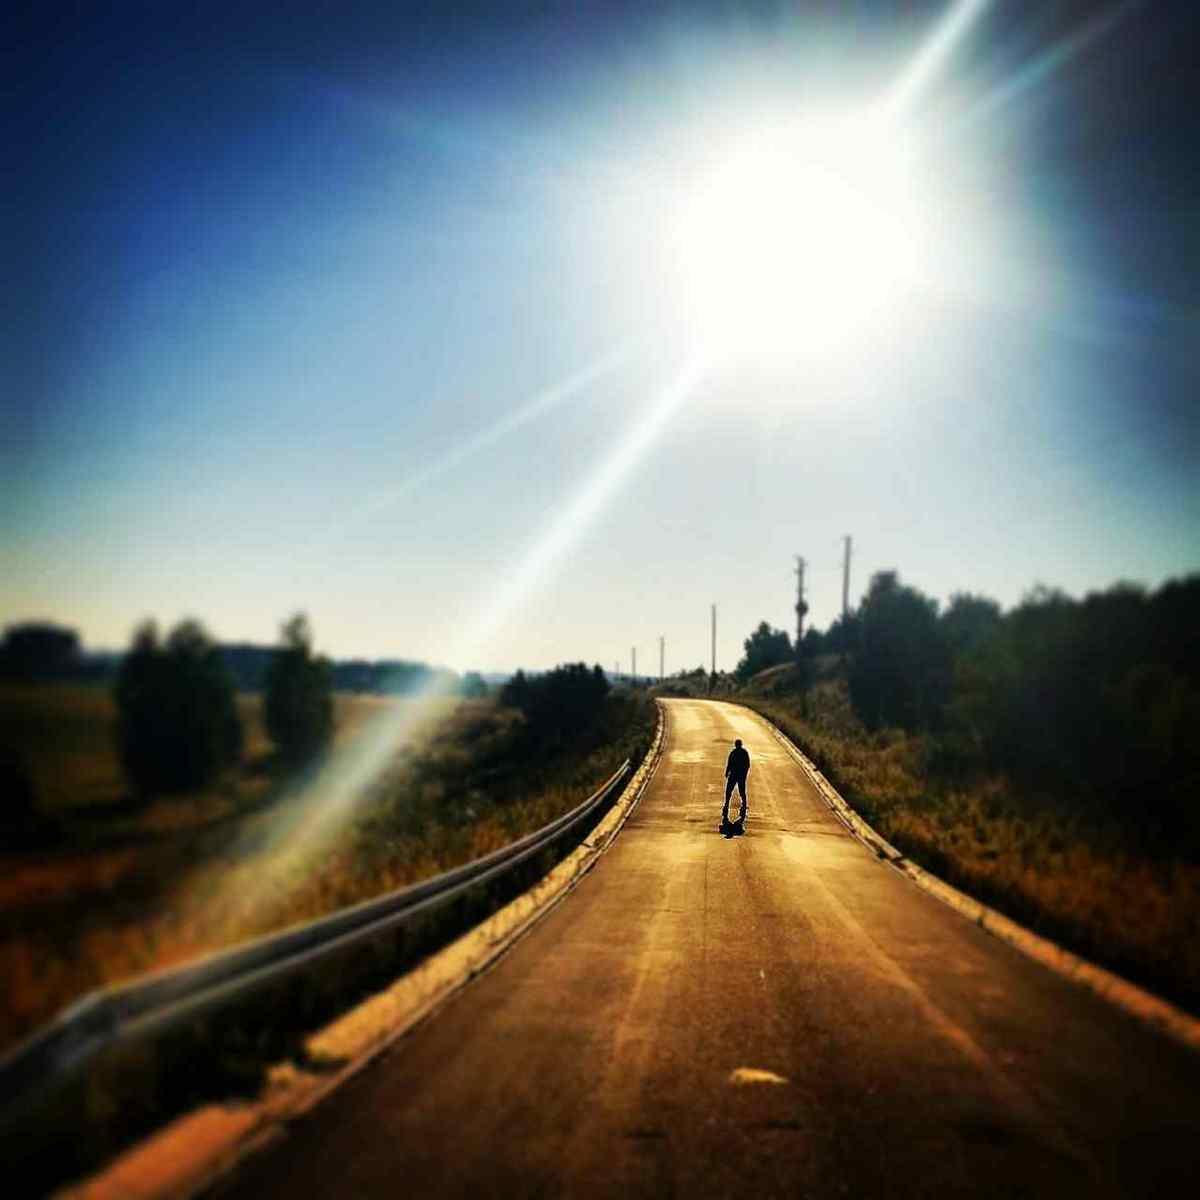 man on road analogy of life journey